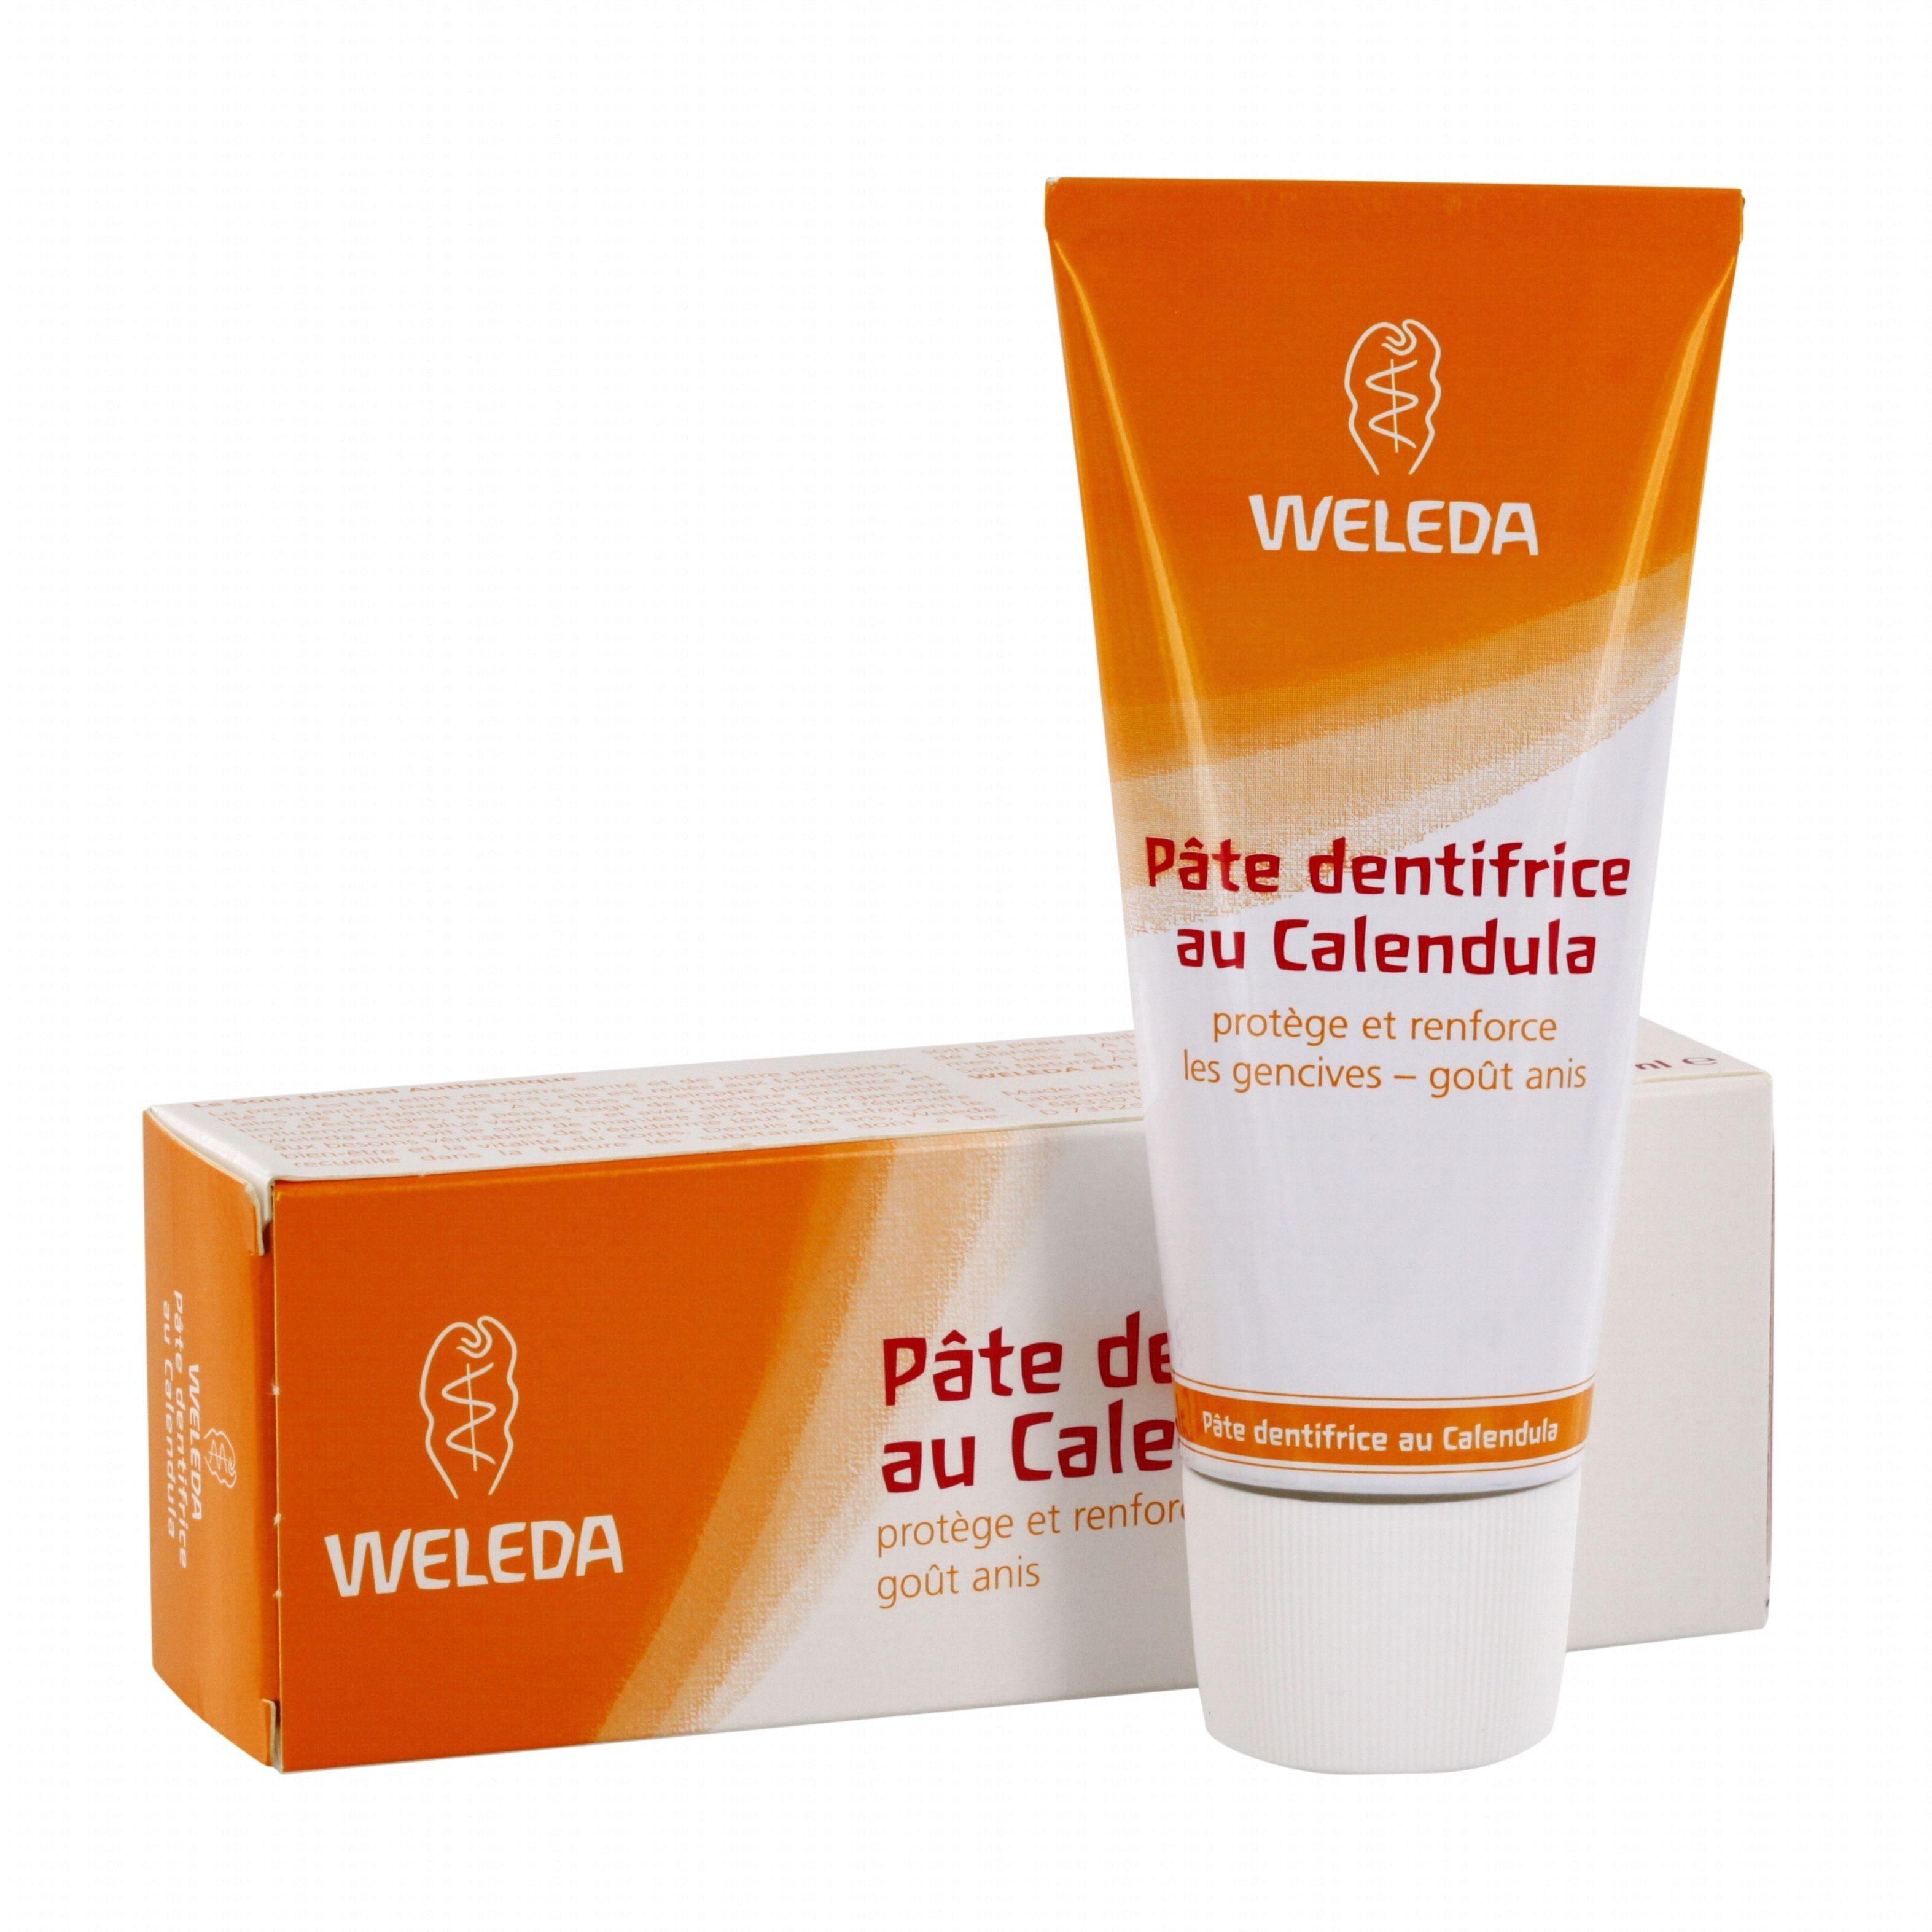 Weleda Dentifrice au Calendula - Protection naturelle contre les caries 75 ml - Weleda